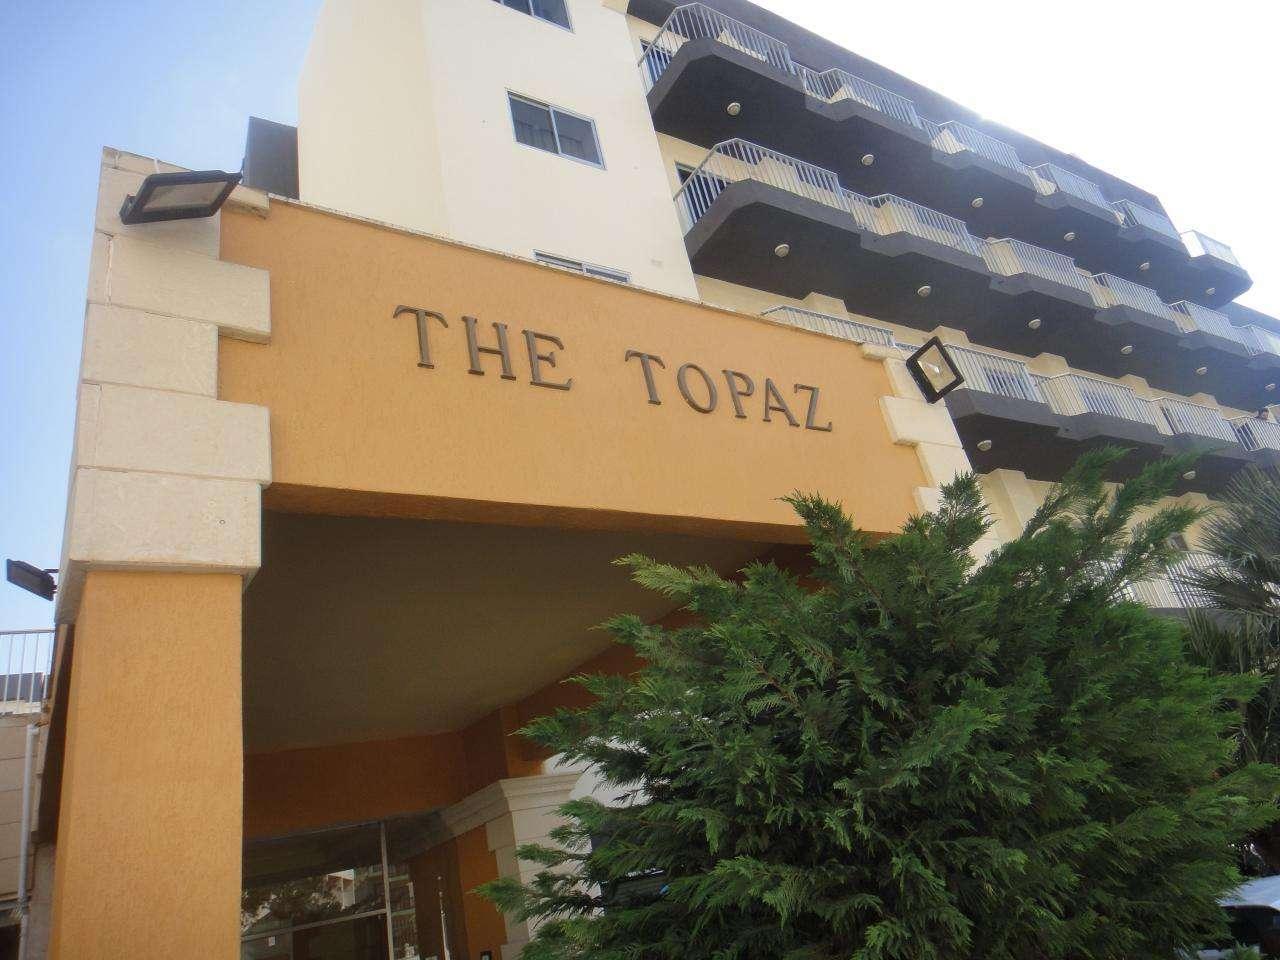 The Topaz